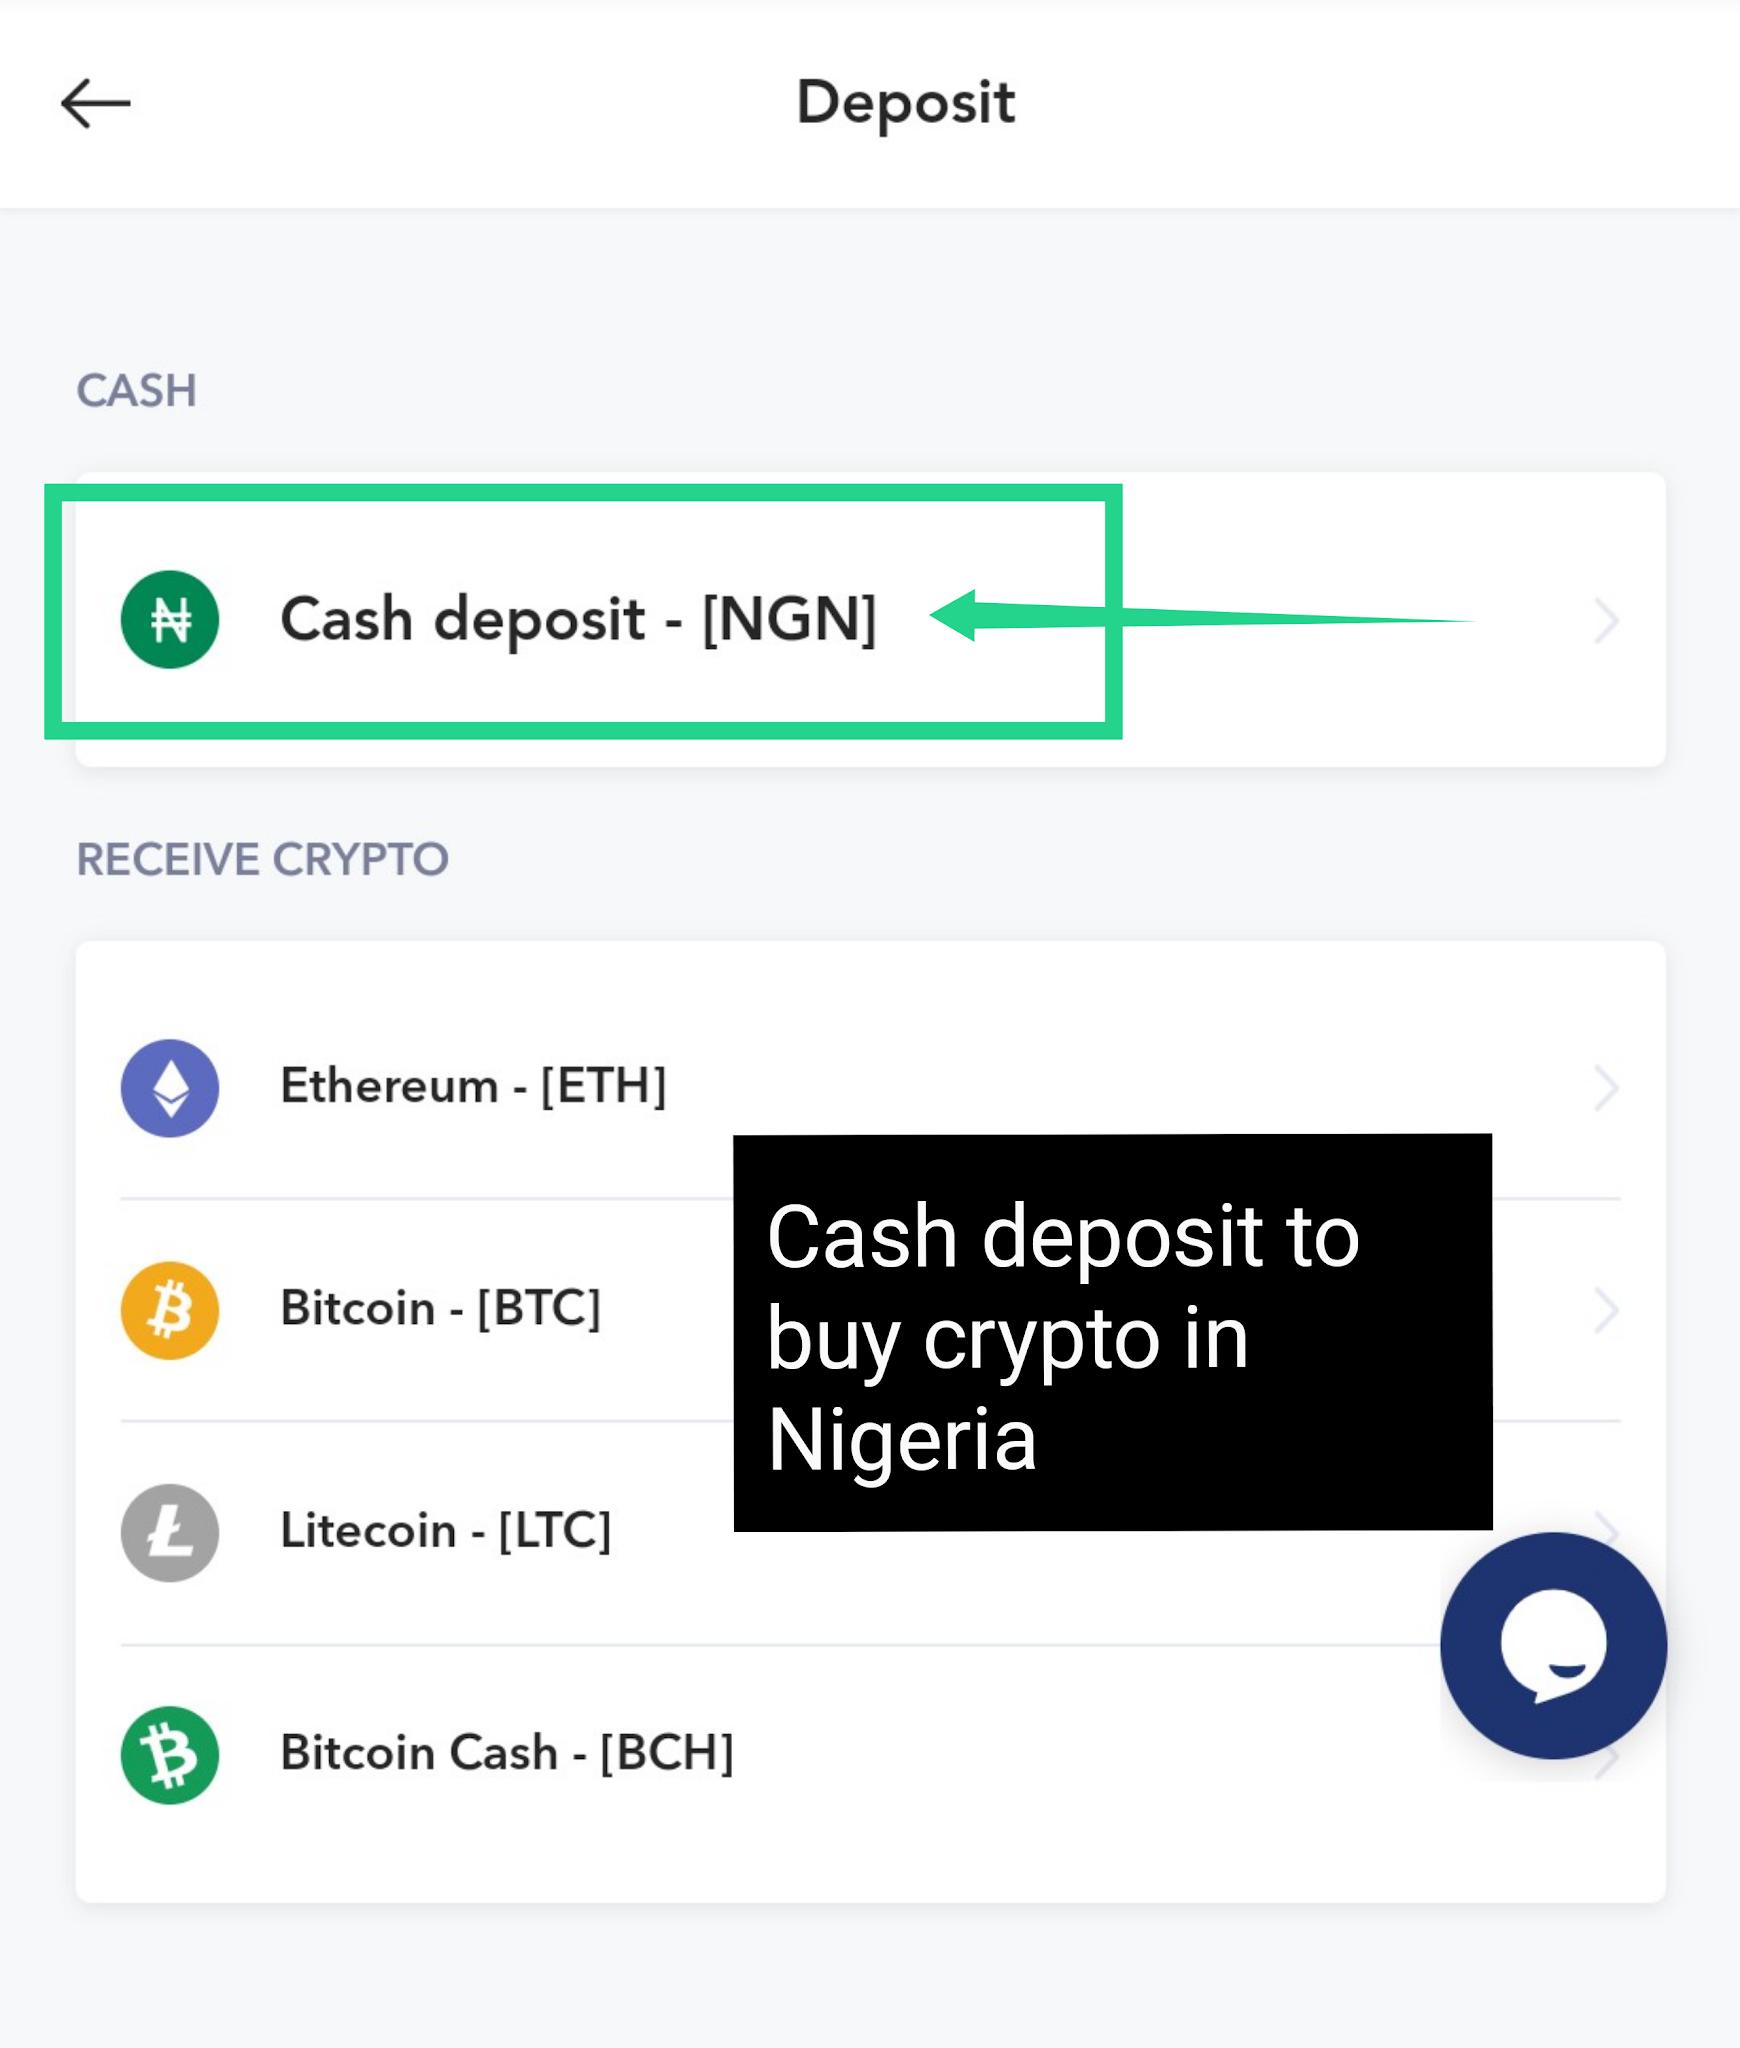 Buy crypto in Nigeria